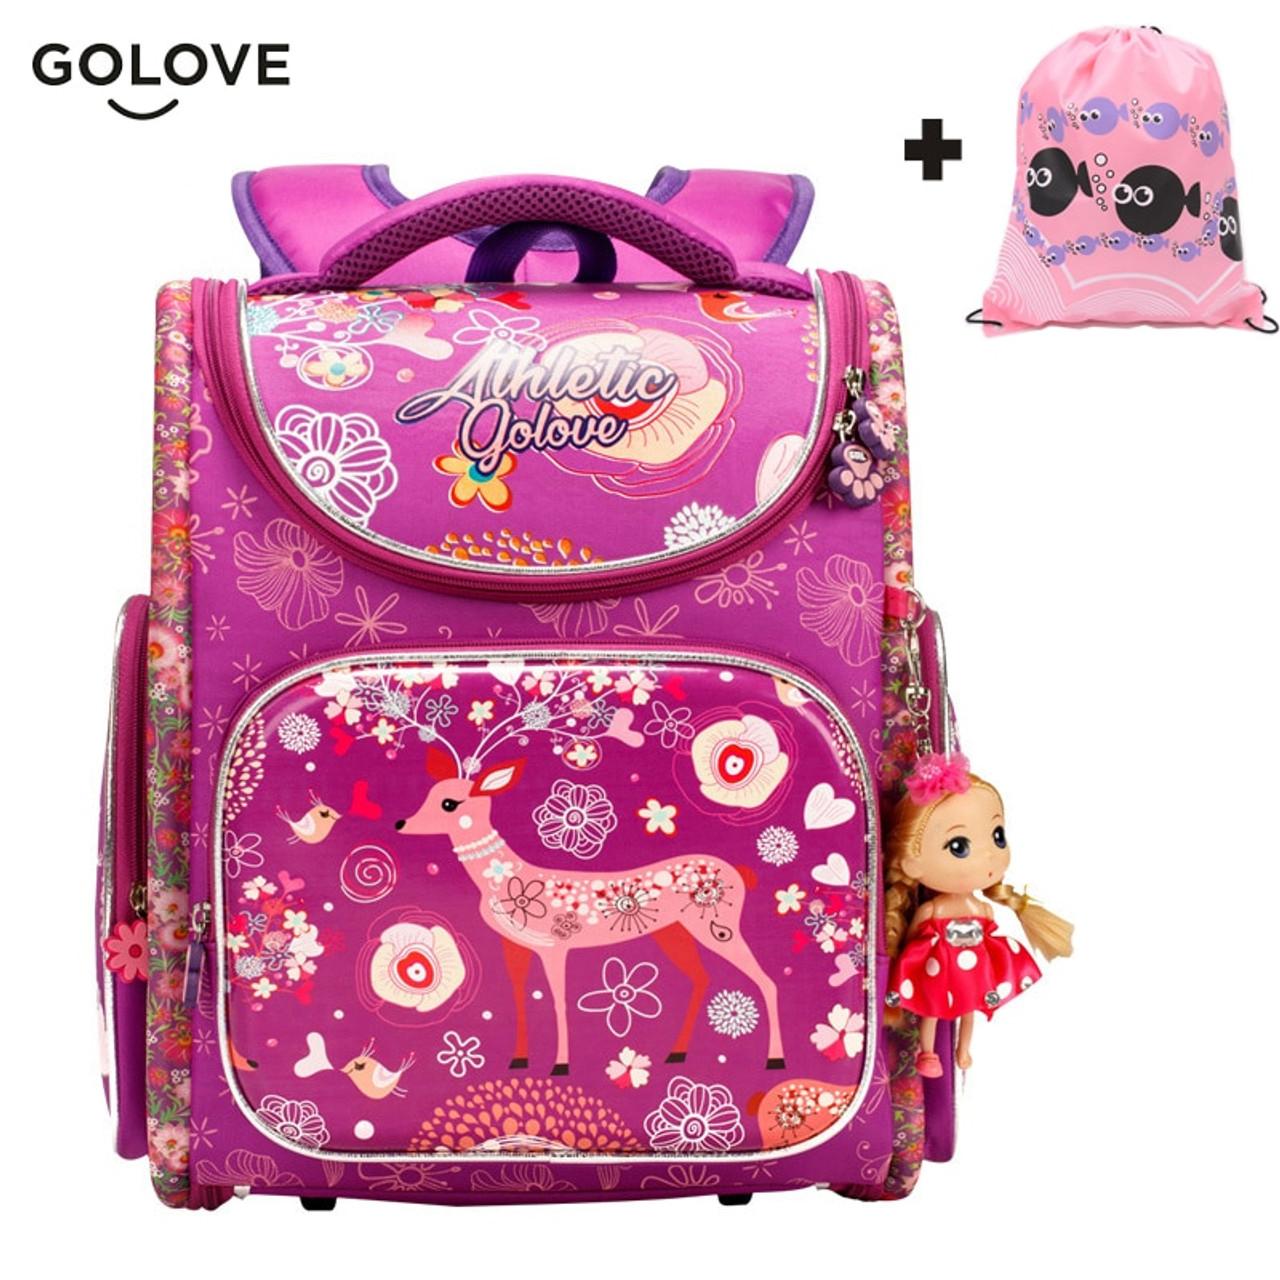 Kids Cartoon School bags safe Orthopedic children school Backpack For Girls